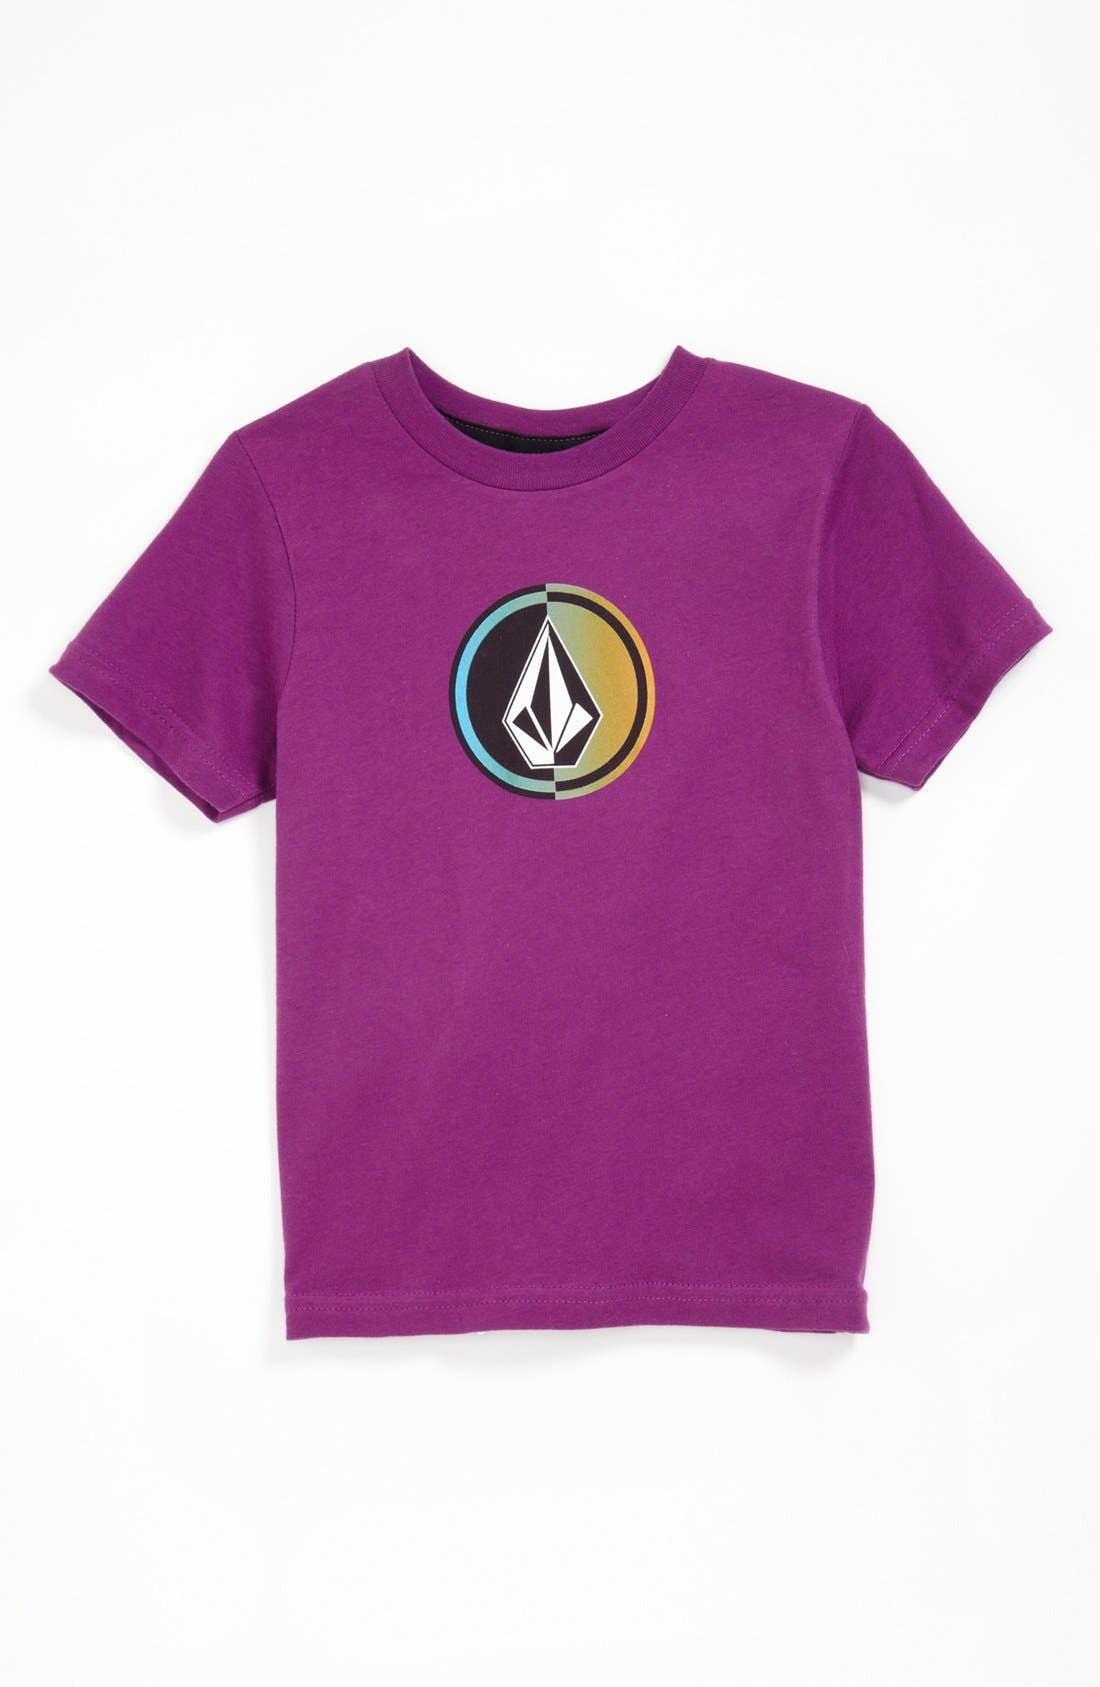 Alternate Image 1 Selected - Volcom 'Circle Stone' T-Shirt (Big Boys)